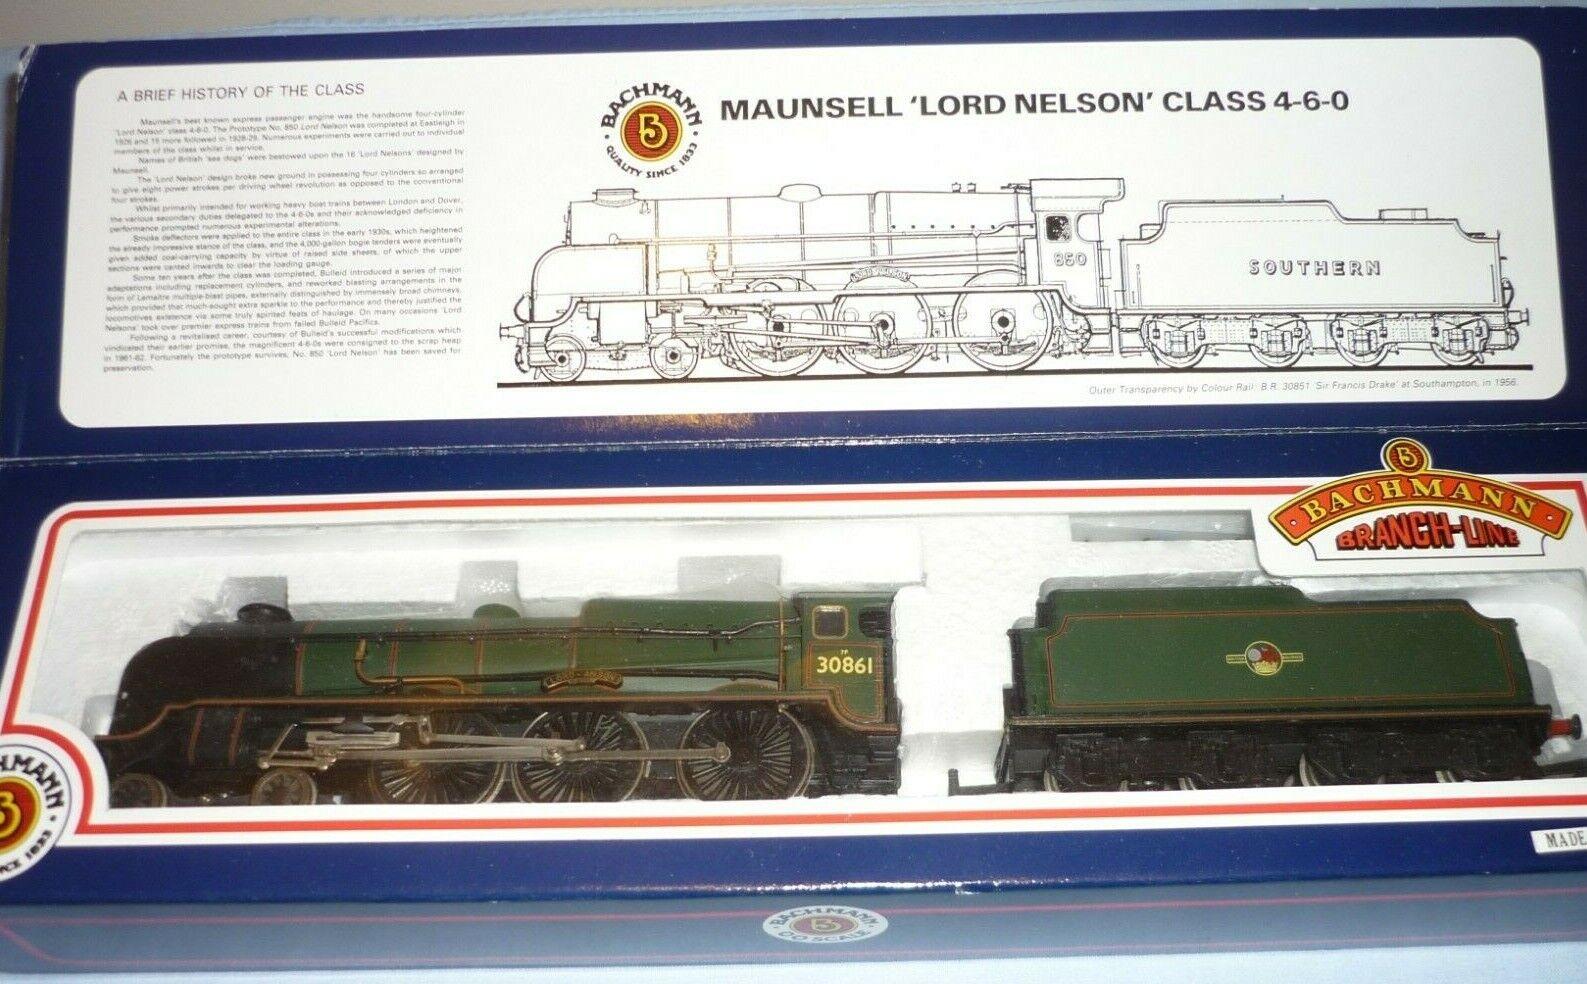 Bachmann Oo Br Lord Nelson Class 4-6-0 Tender Loco 30861 Lord Anson en Caja